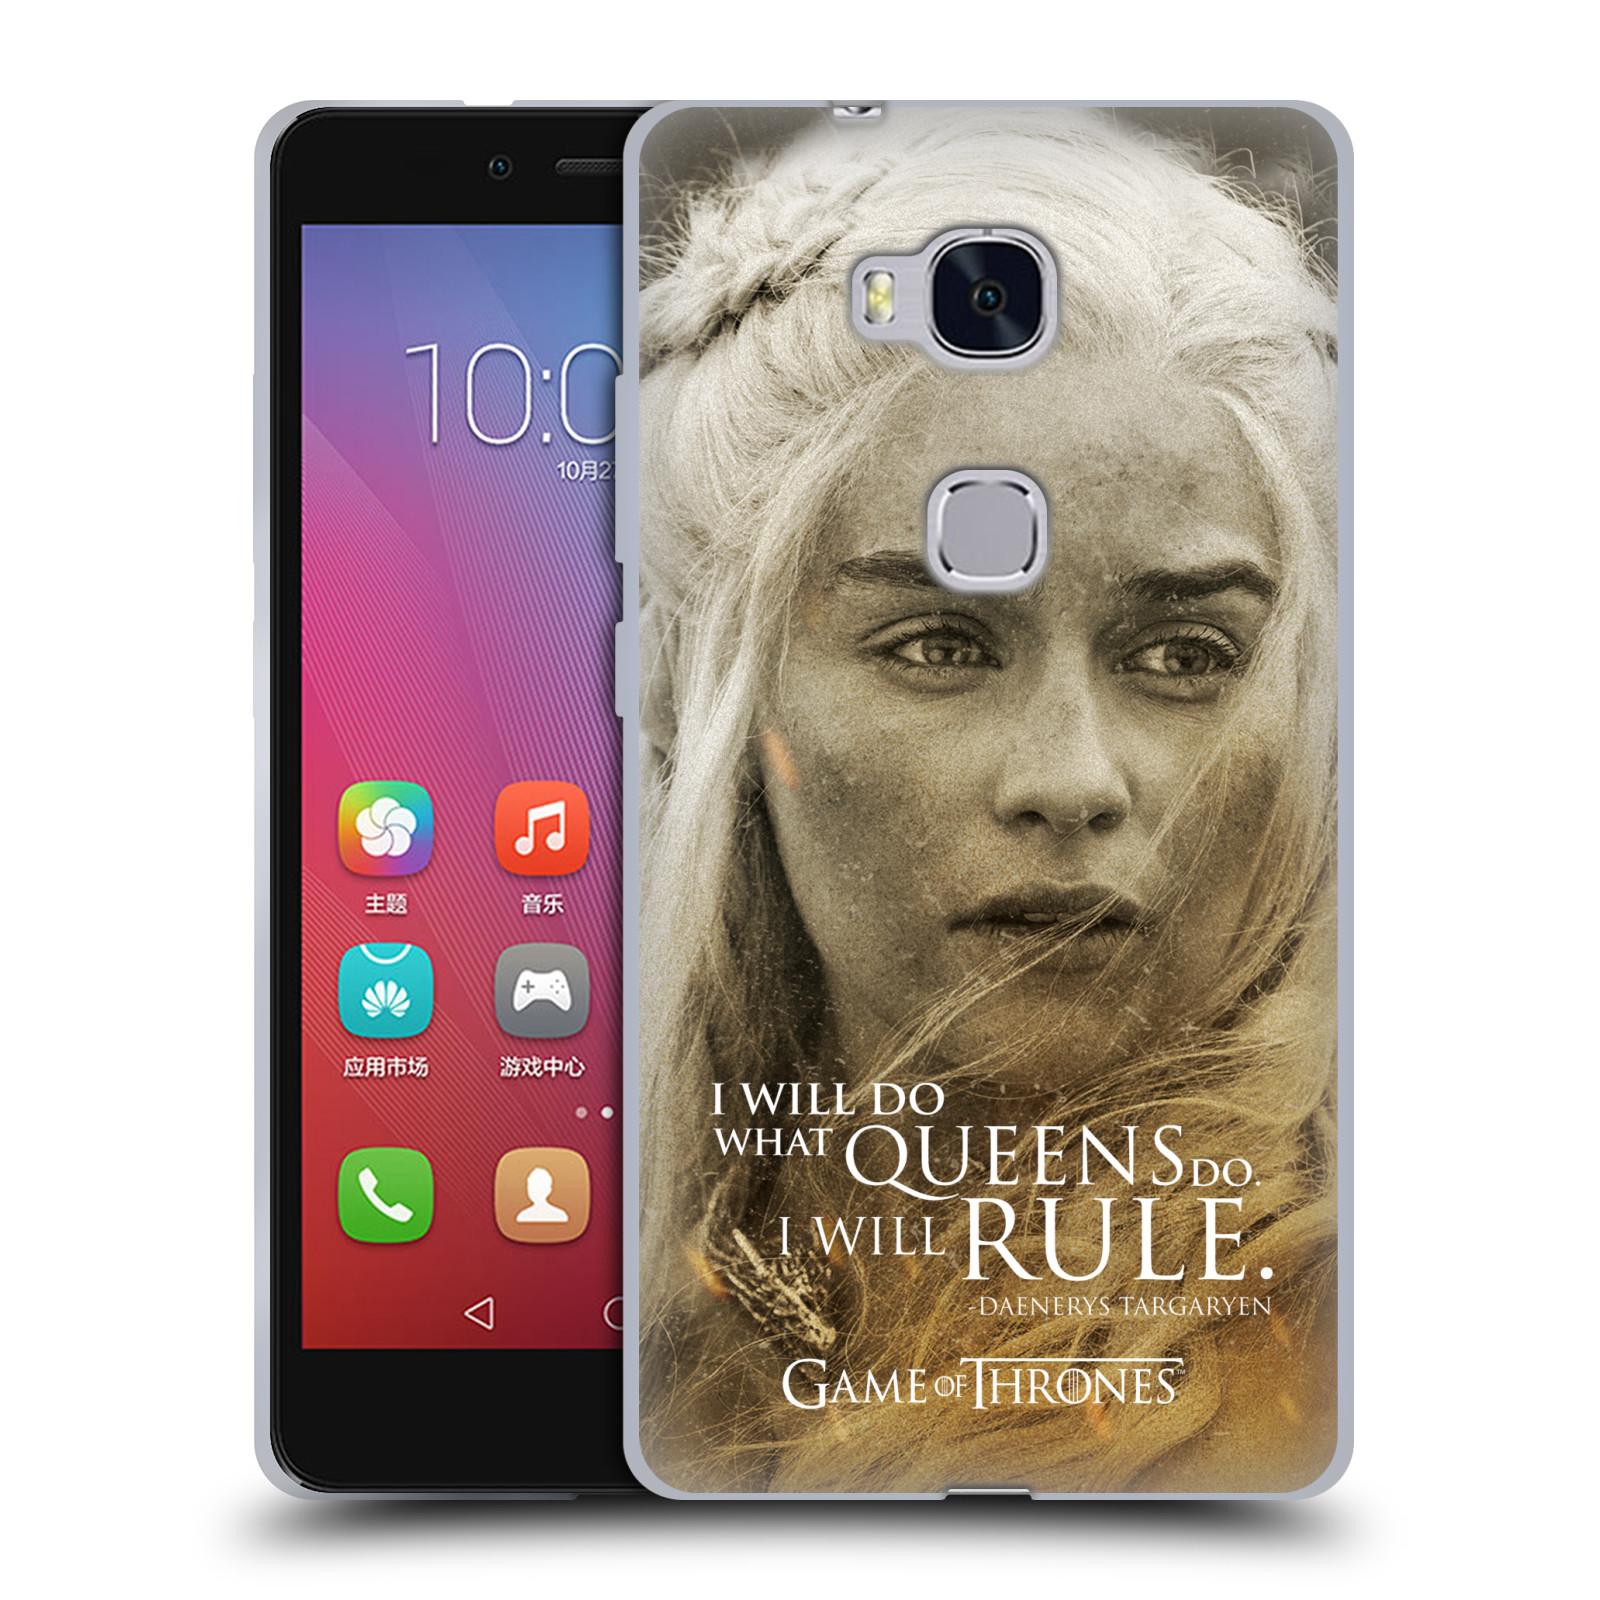 Silikonové pouzdro na mobil Honor 5X HEAD CASE Hra o trůny - Daenerys Targaryen